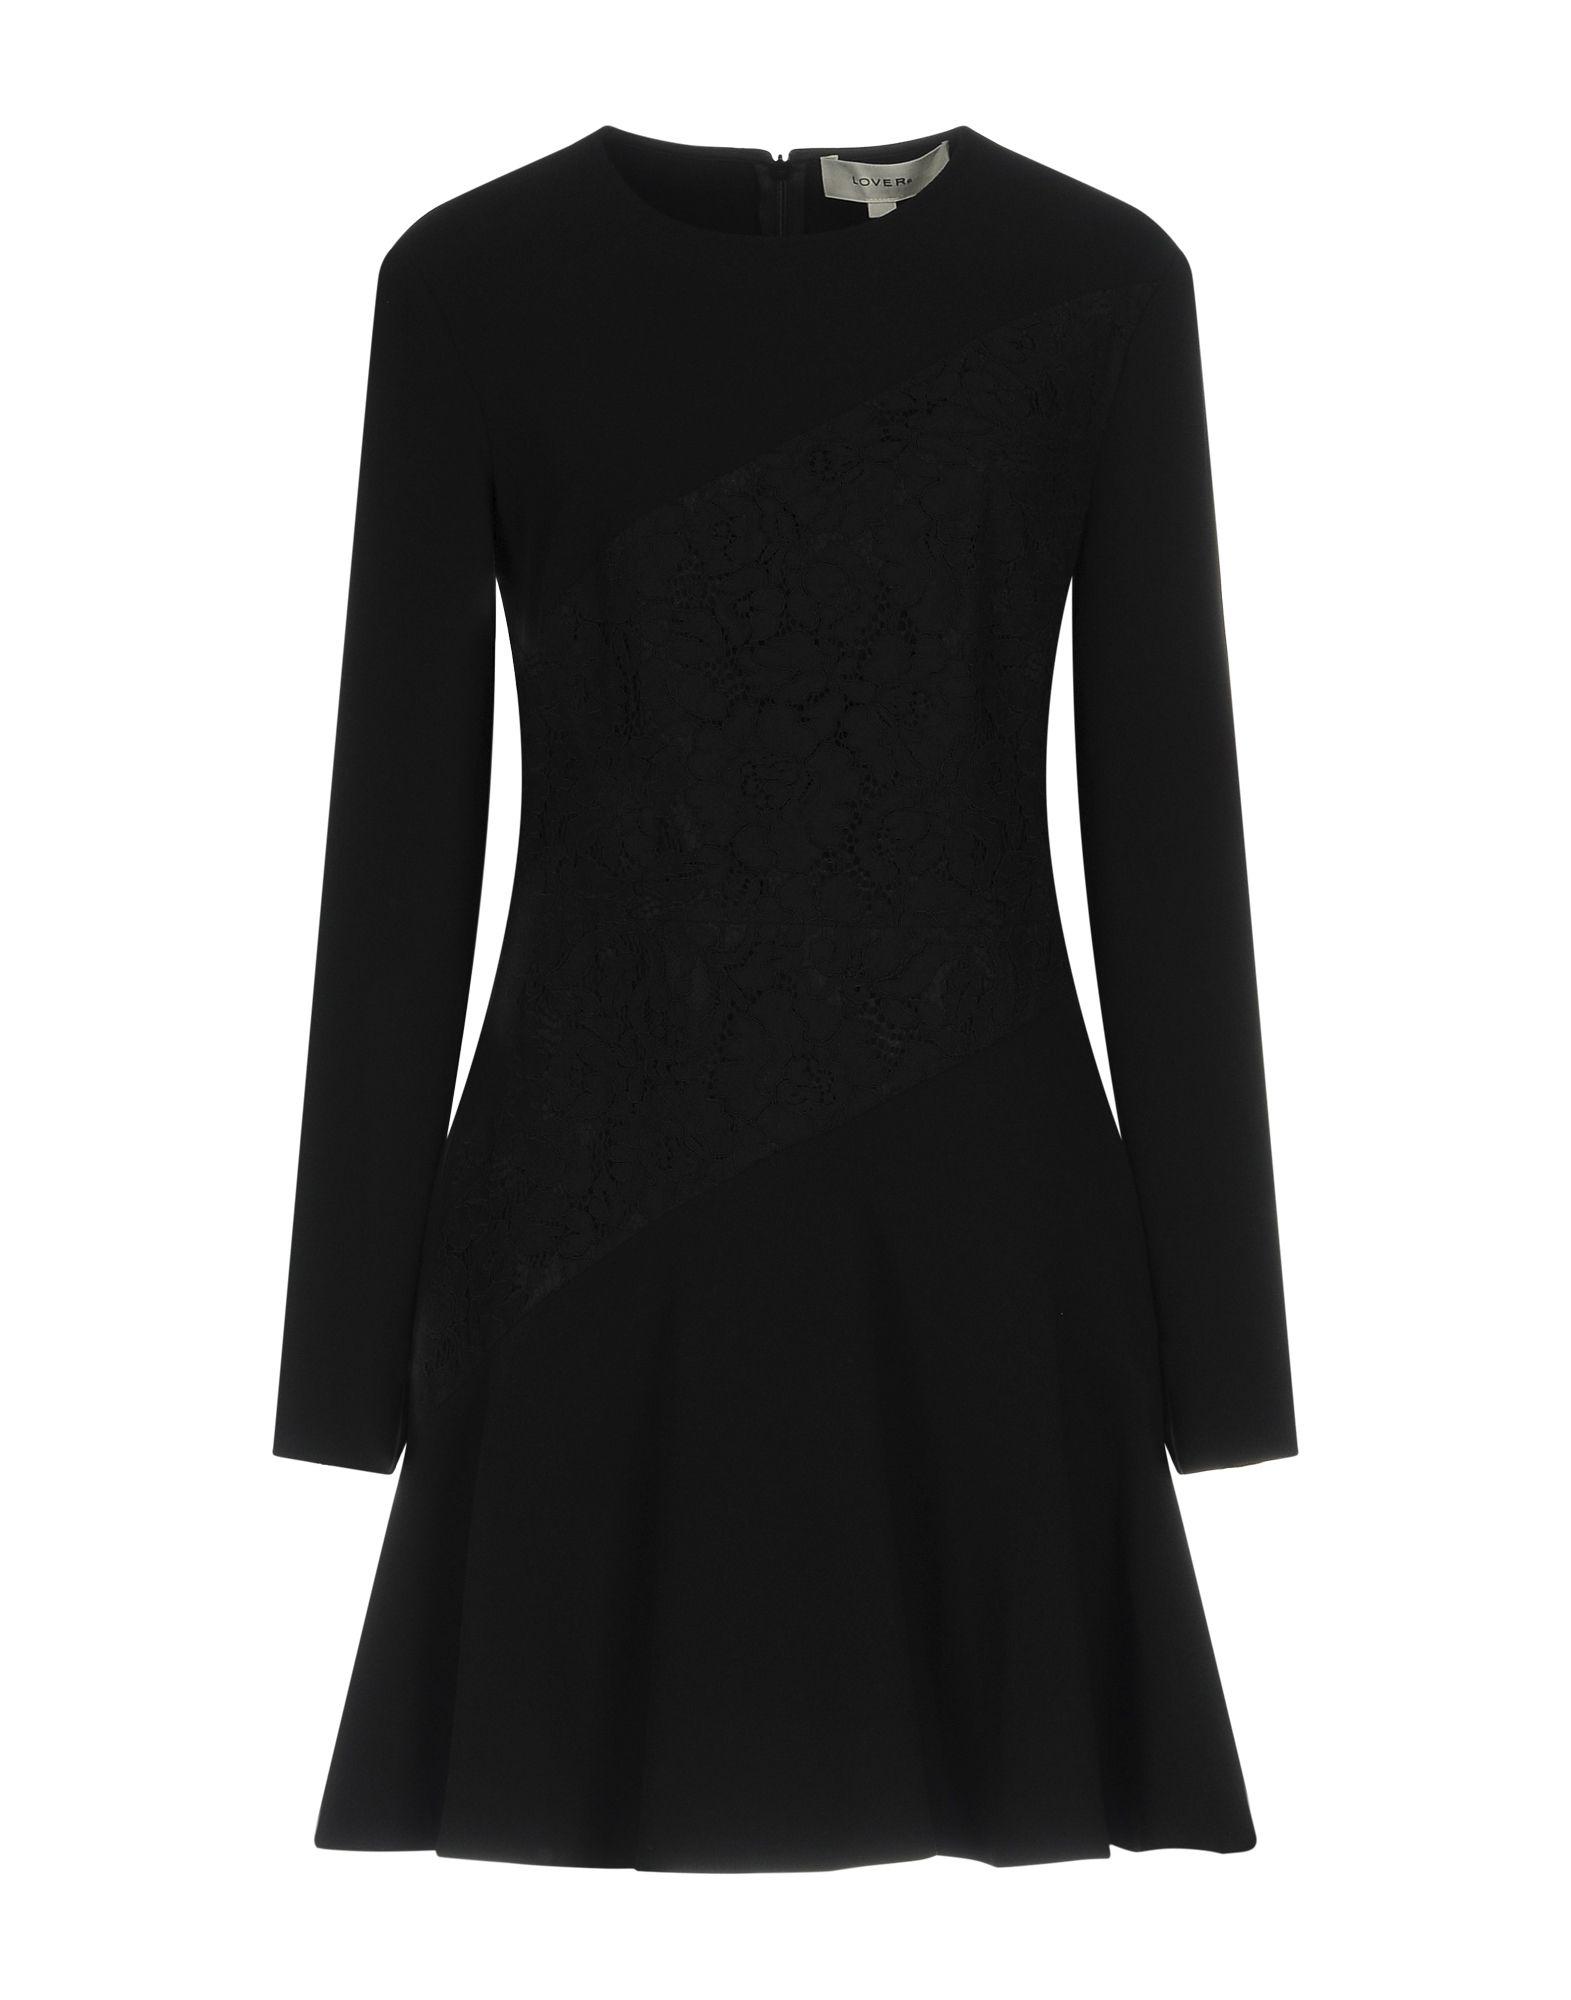 LOVER Short Dress in Black